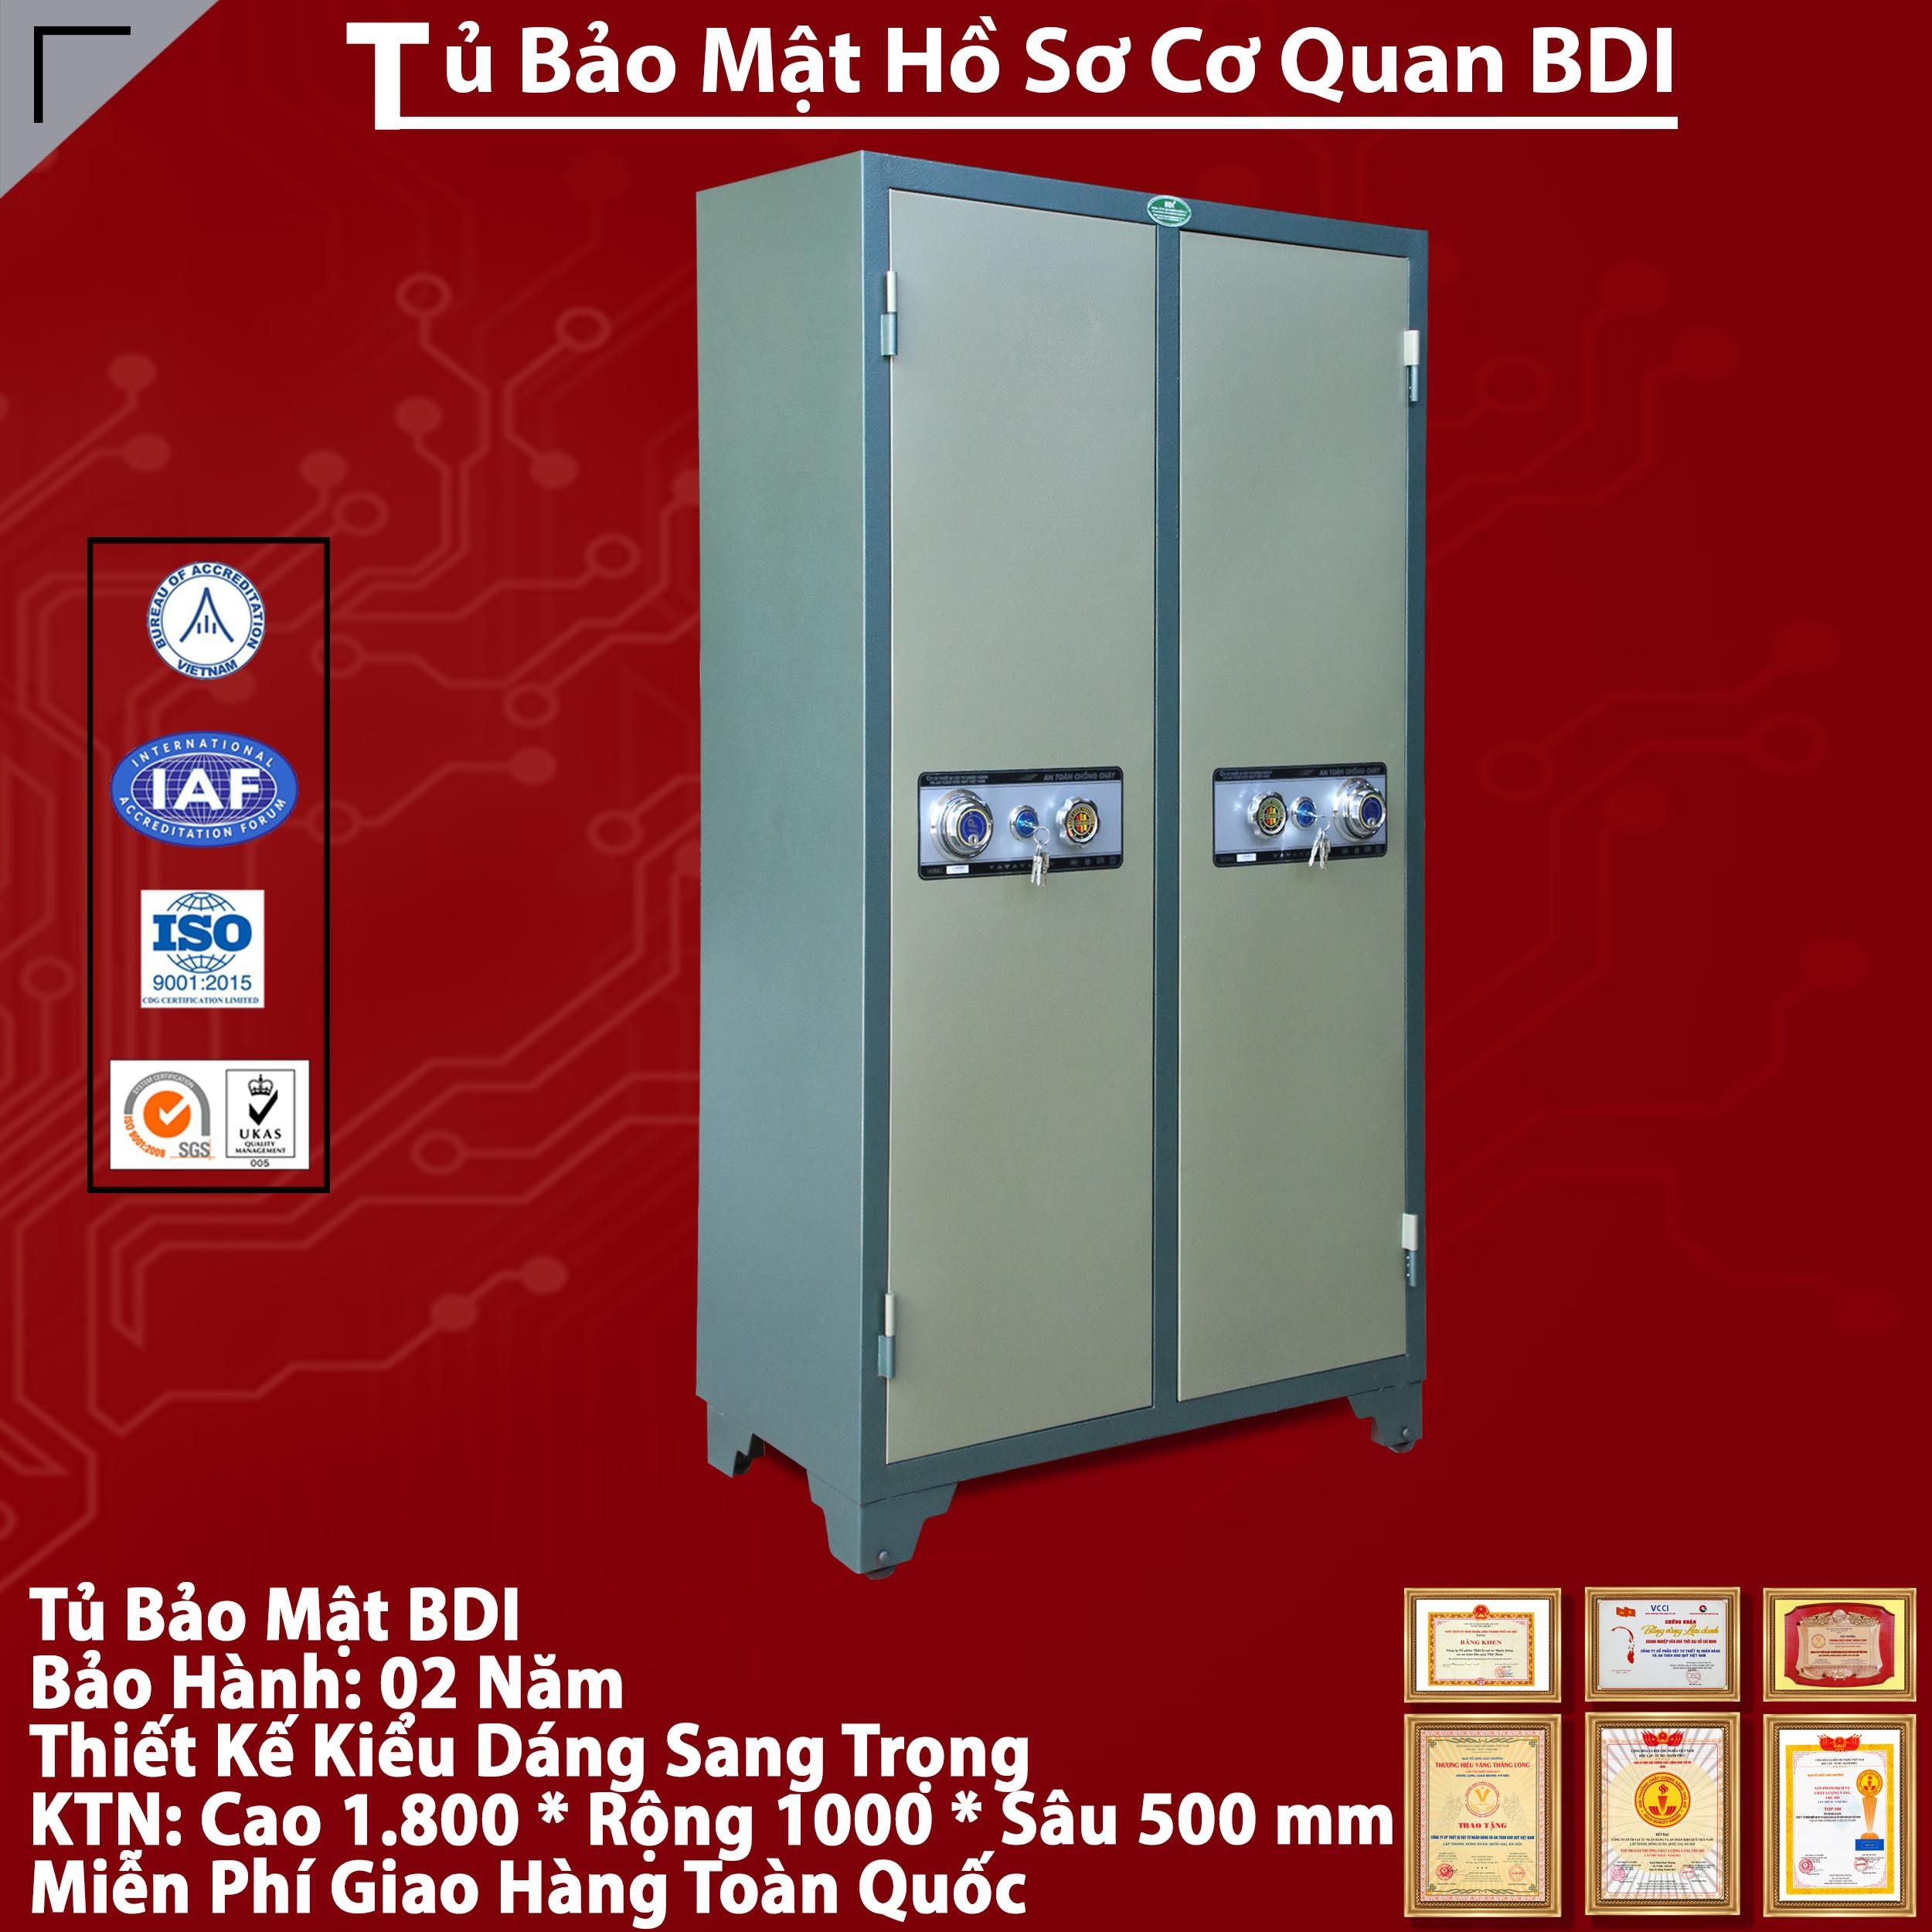 Dai Li Tu Bao Mat Khoa Doi Ma